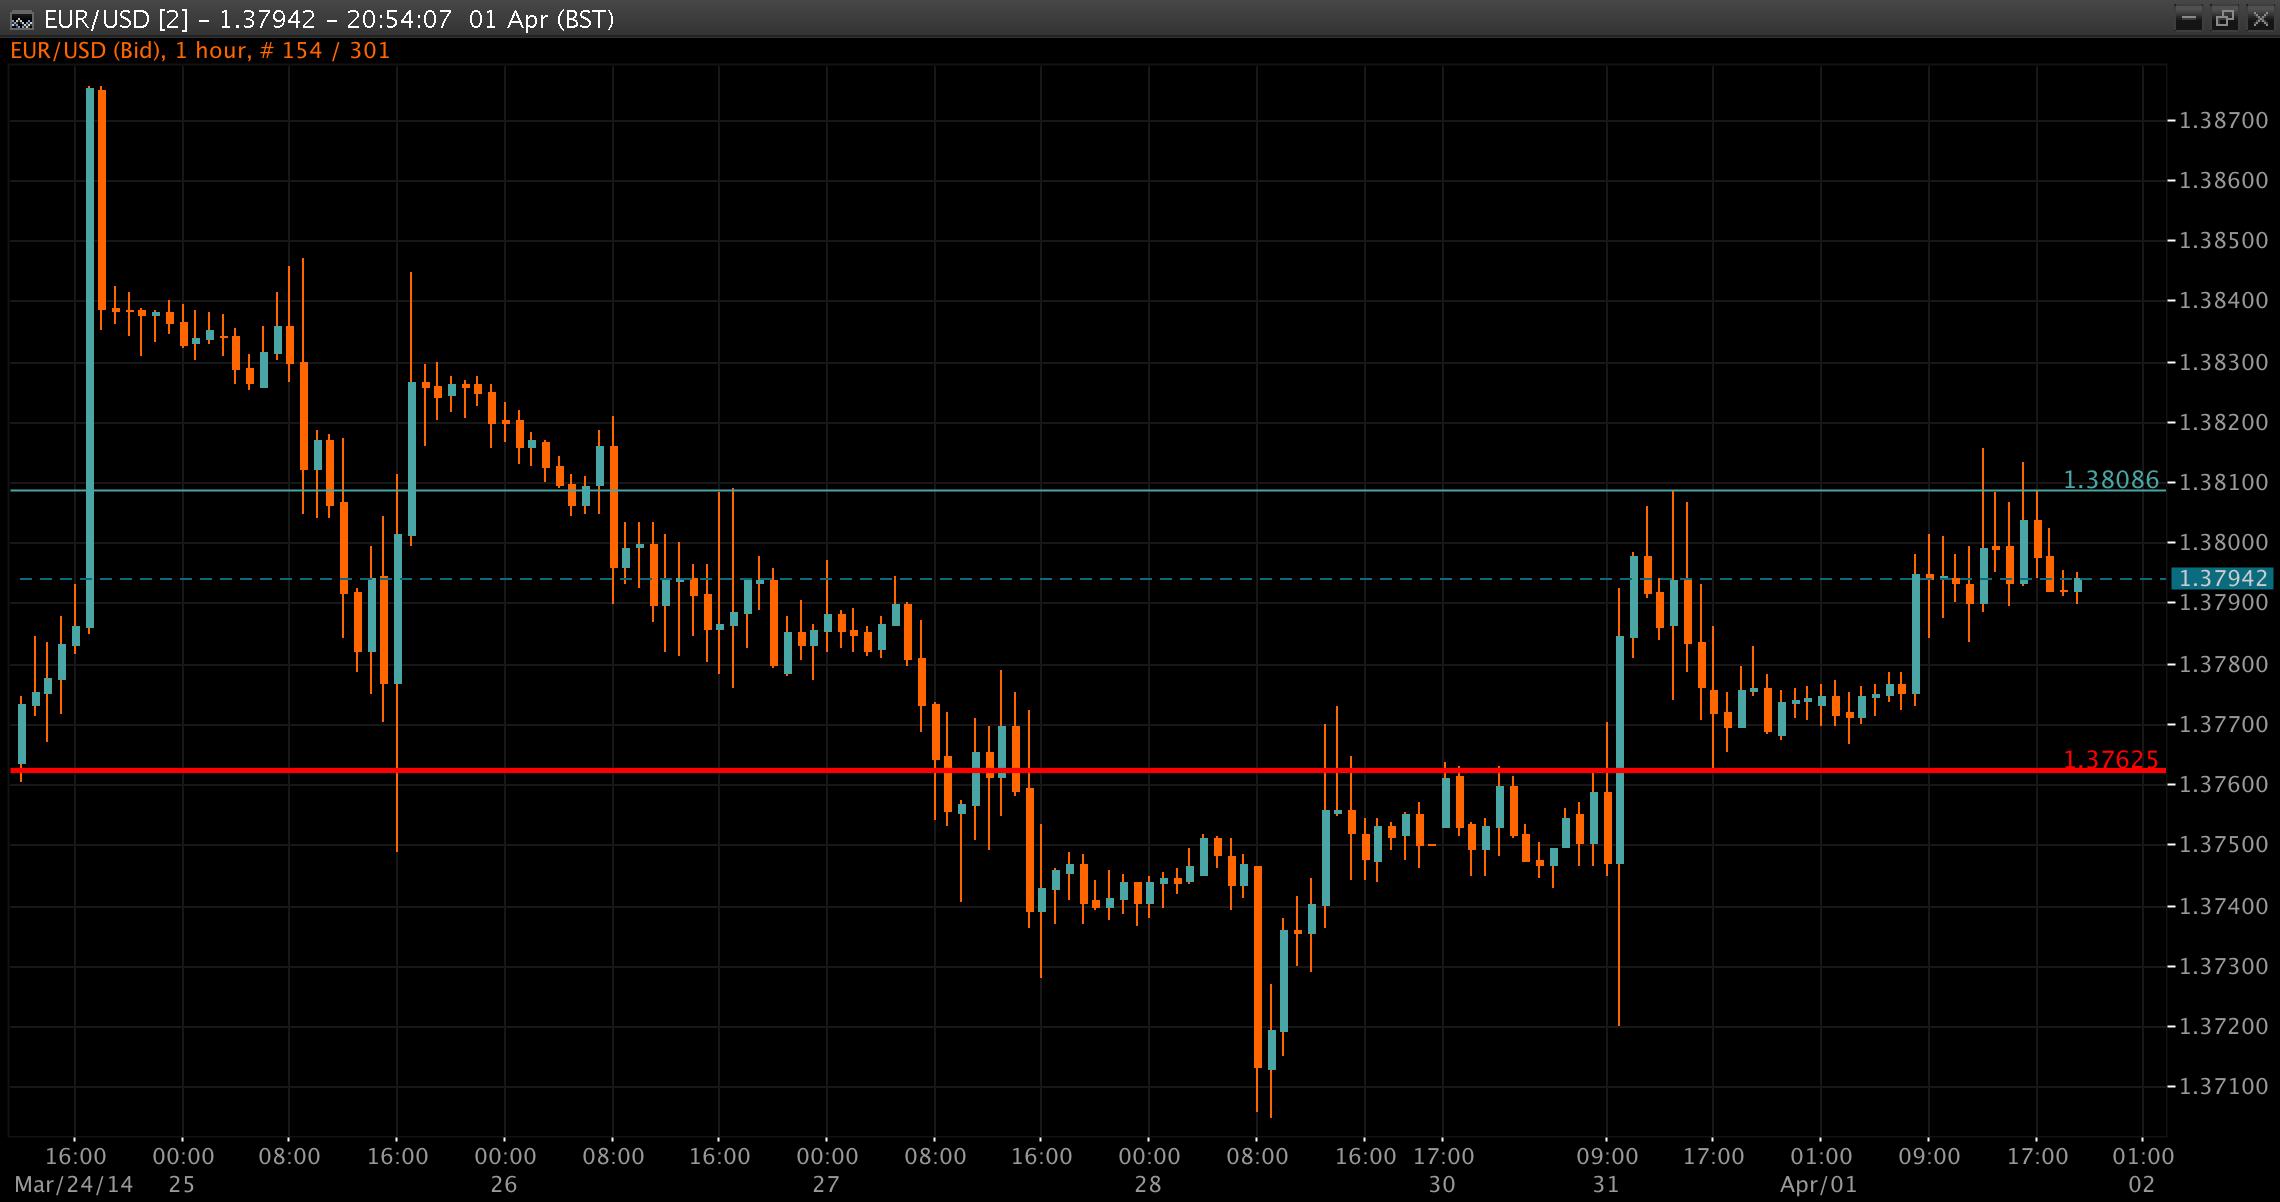 EUR/USD Chart 2 Apr 2014